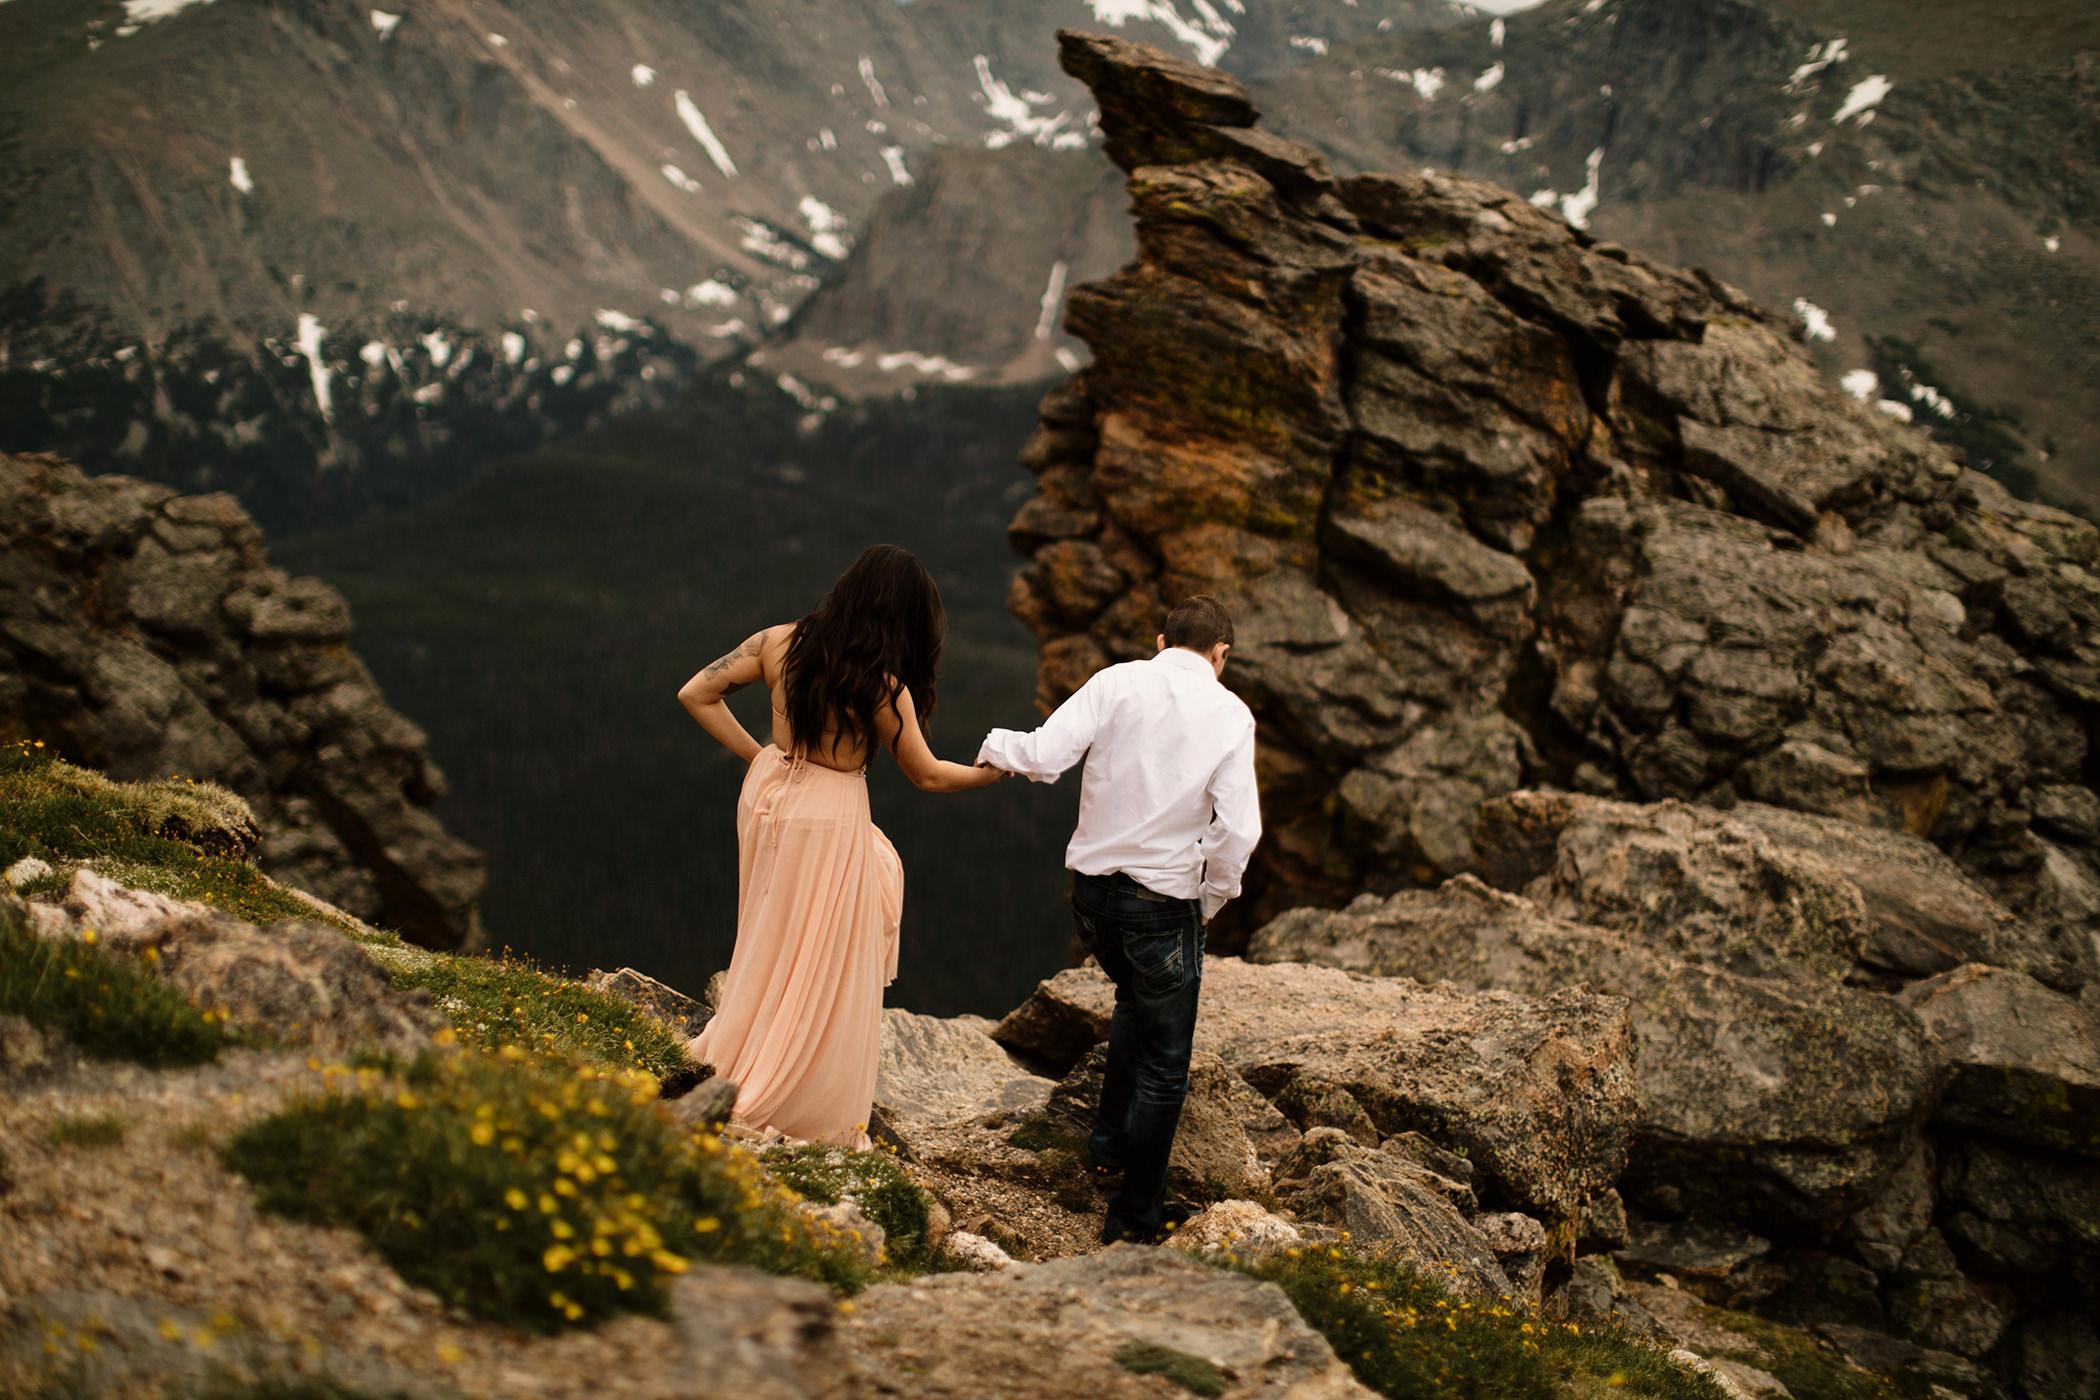 rocky mountain national park photoshoot session photography photographer liz osban colorado engagement elopement love couples film wyoming adventure wedding adrianna devin riekens